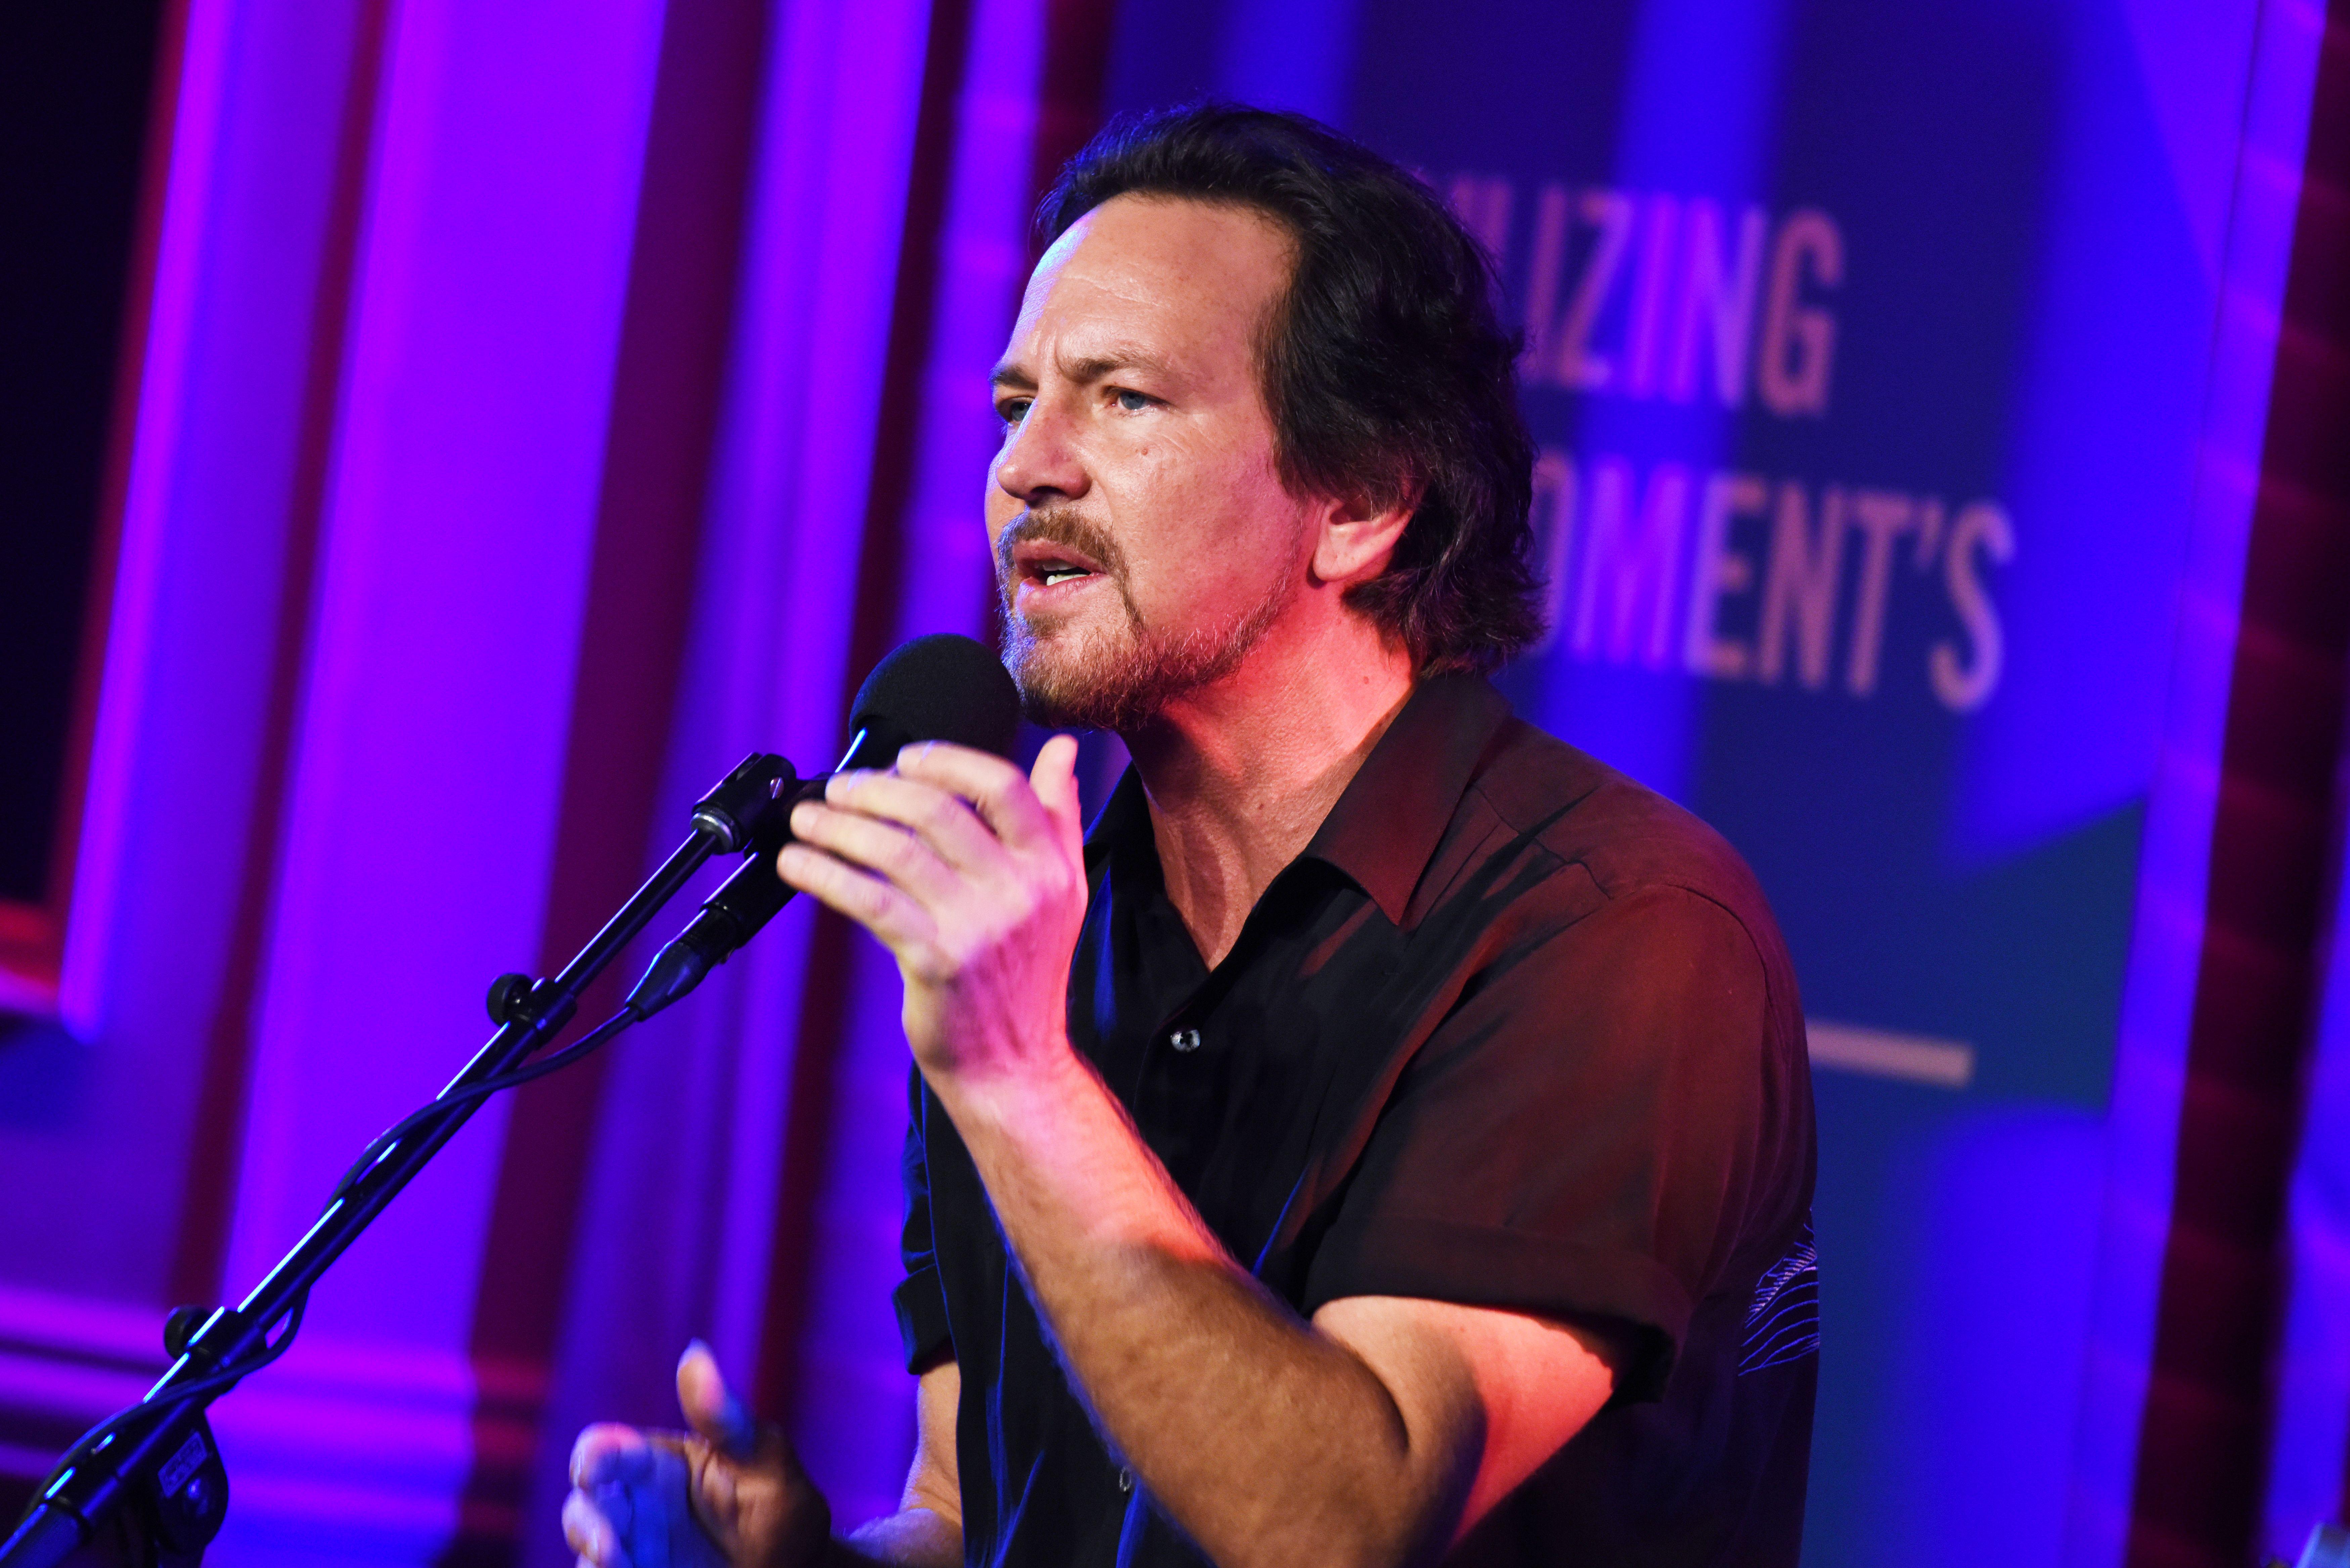 Eddie Vedder UJA-Federation of New York's Music Visionary of the Year Award Luncheon, Inside, New York, USA - 14 Jun 2017